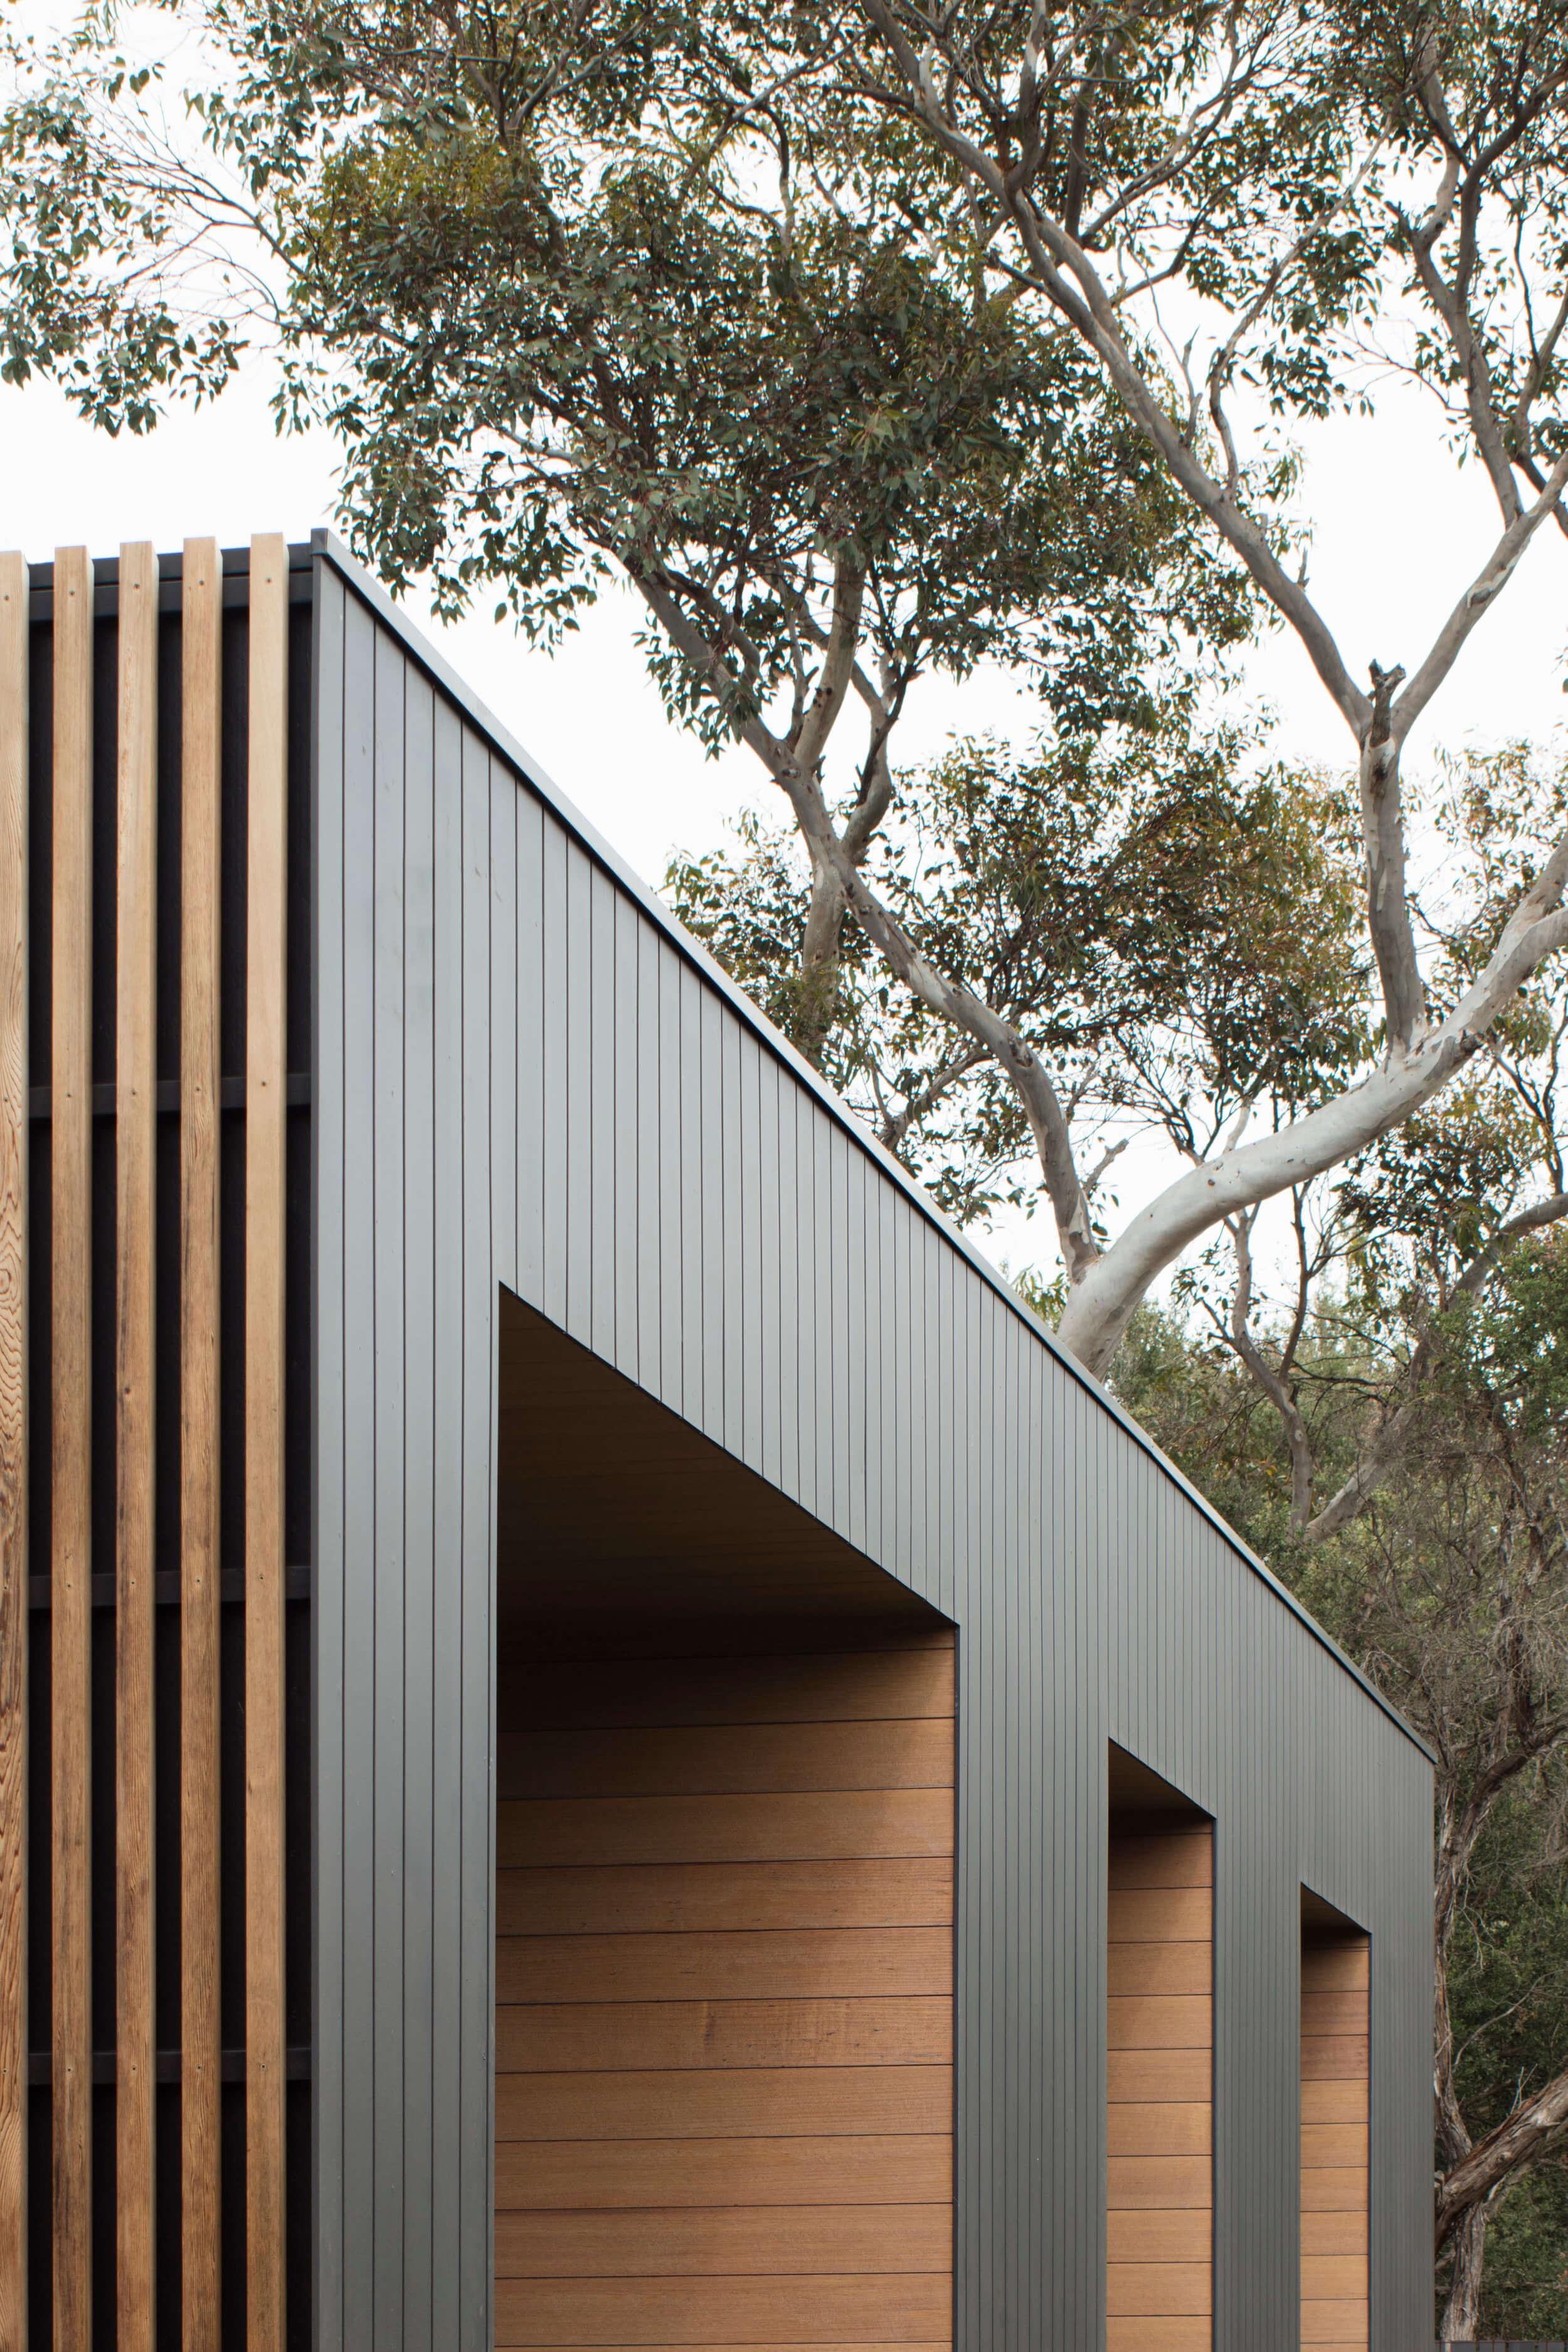 Seachange House by Solomon Troup Architects